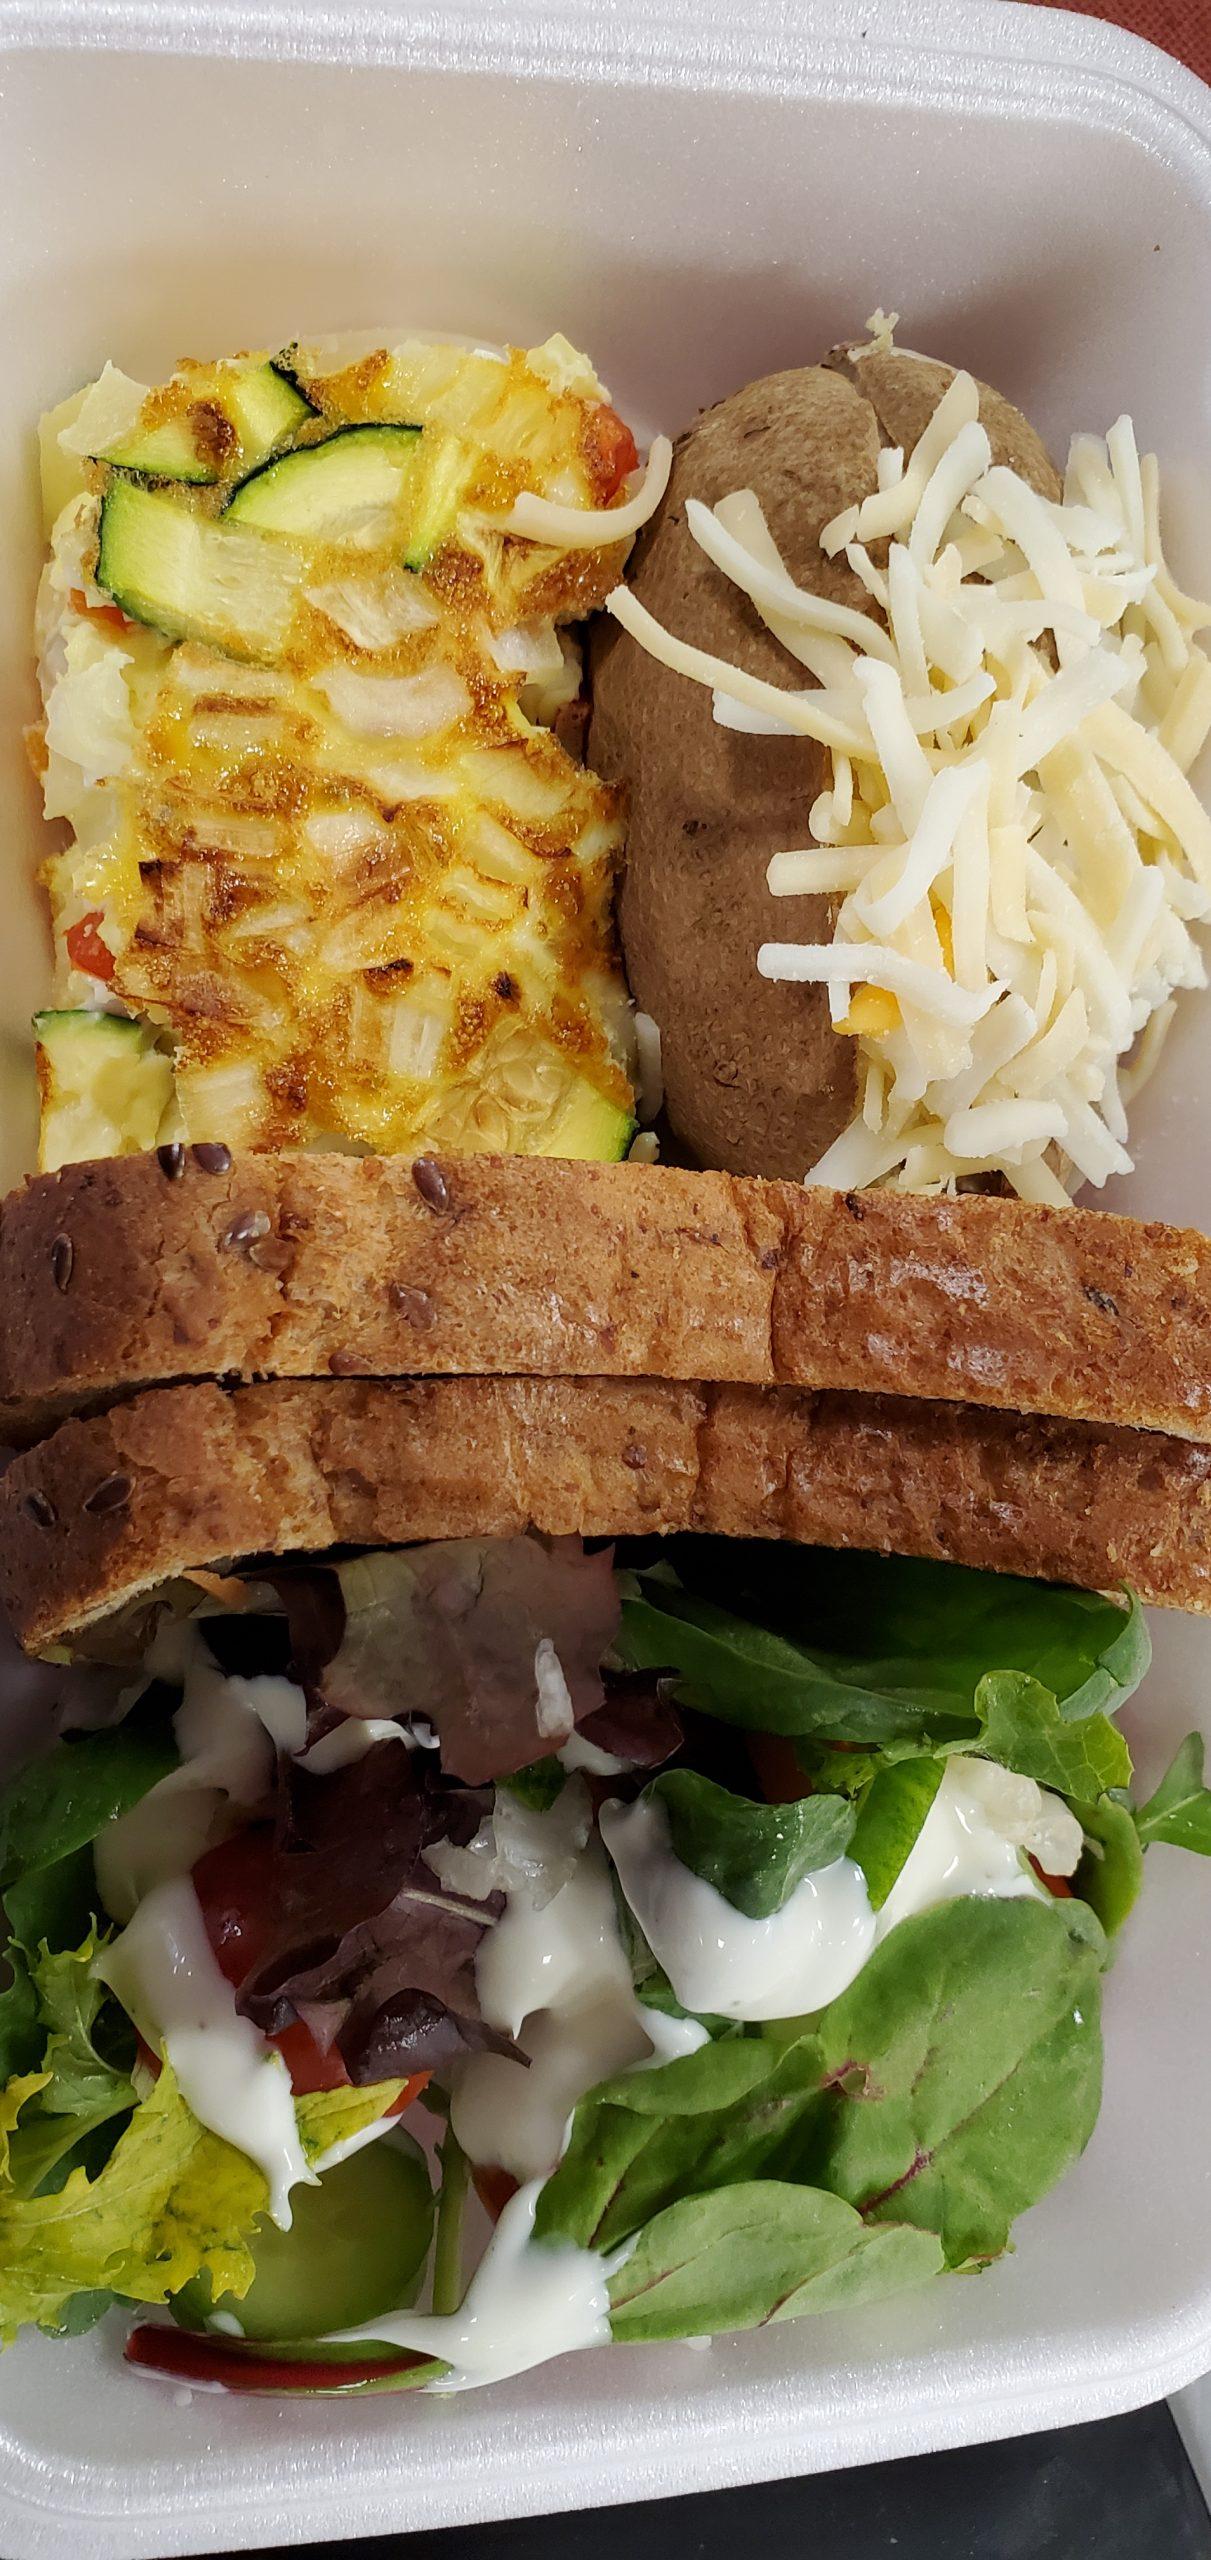 Vegetable Fritta, Salad, and Stuffed Baked Potato